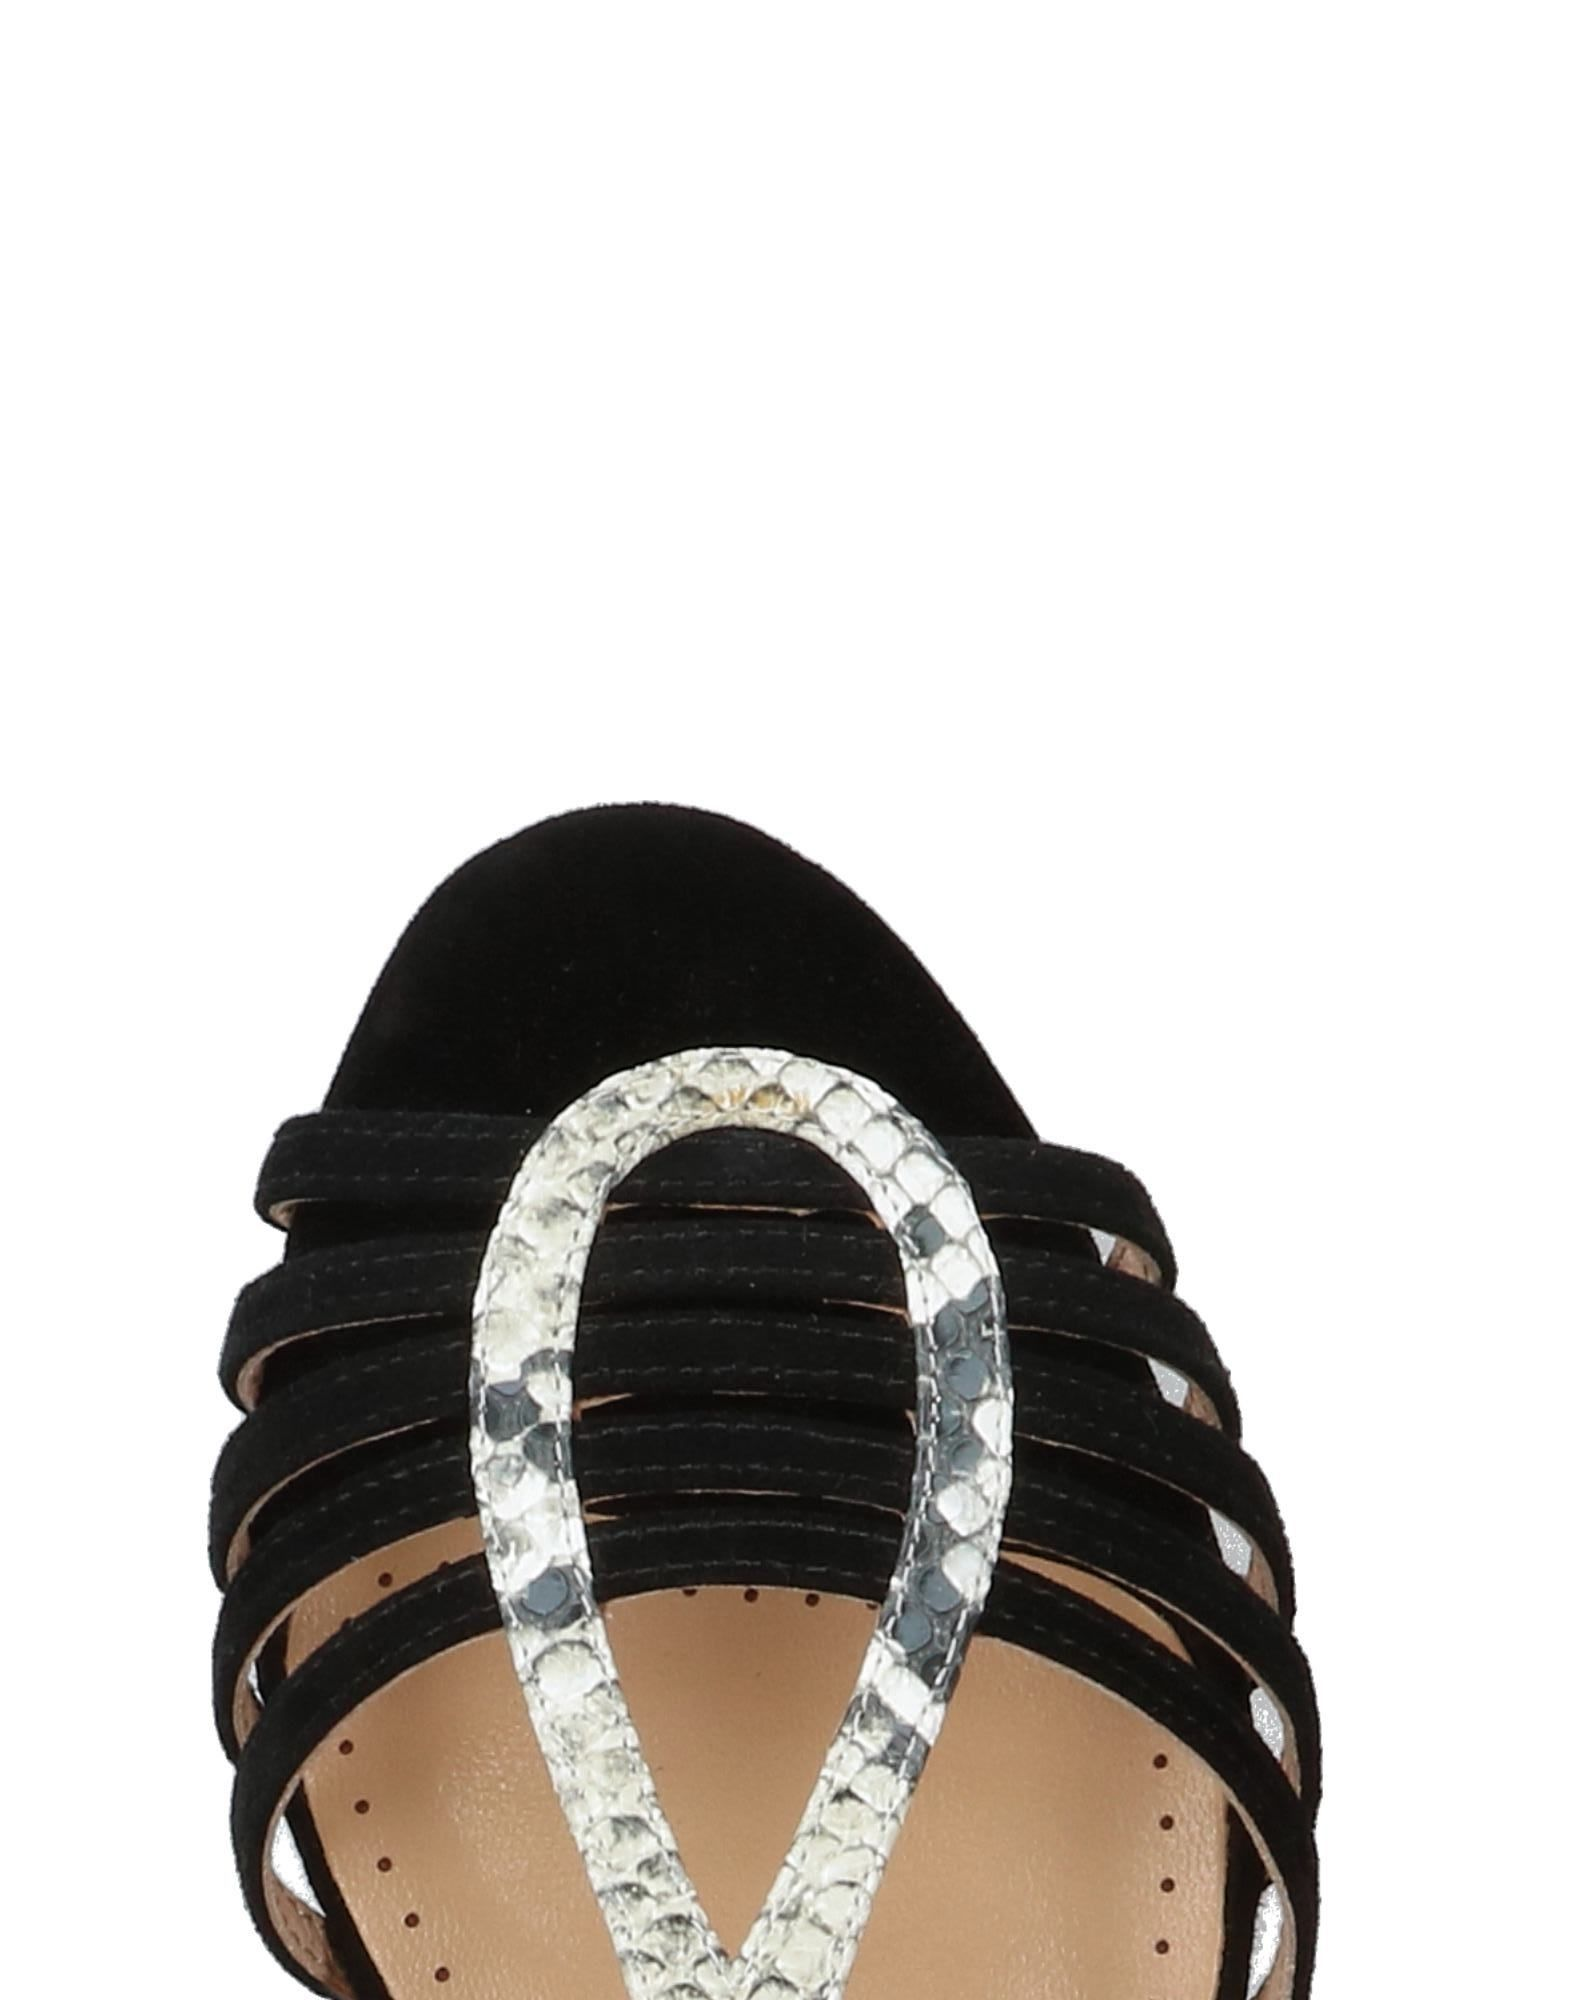 Bibi 11346933NA Lou Sandalen Damen  11346933NA Bibi Gute Qualität beliebte Schuhe db6143